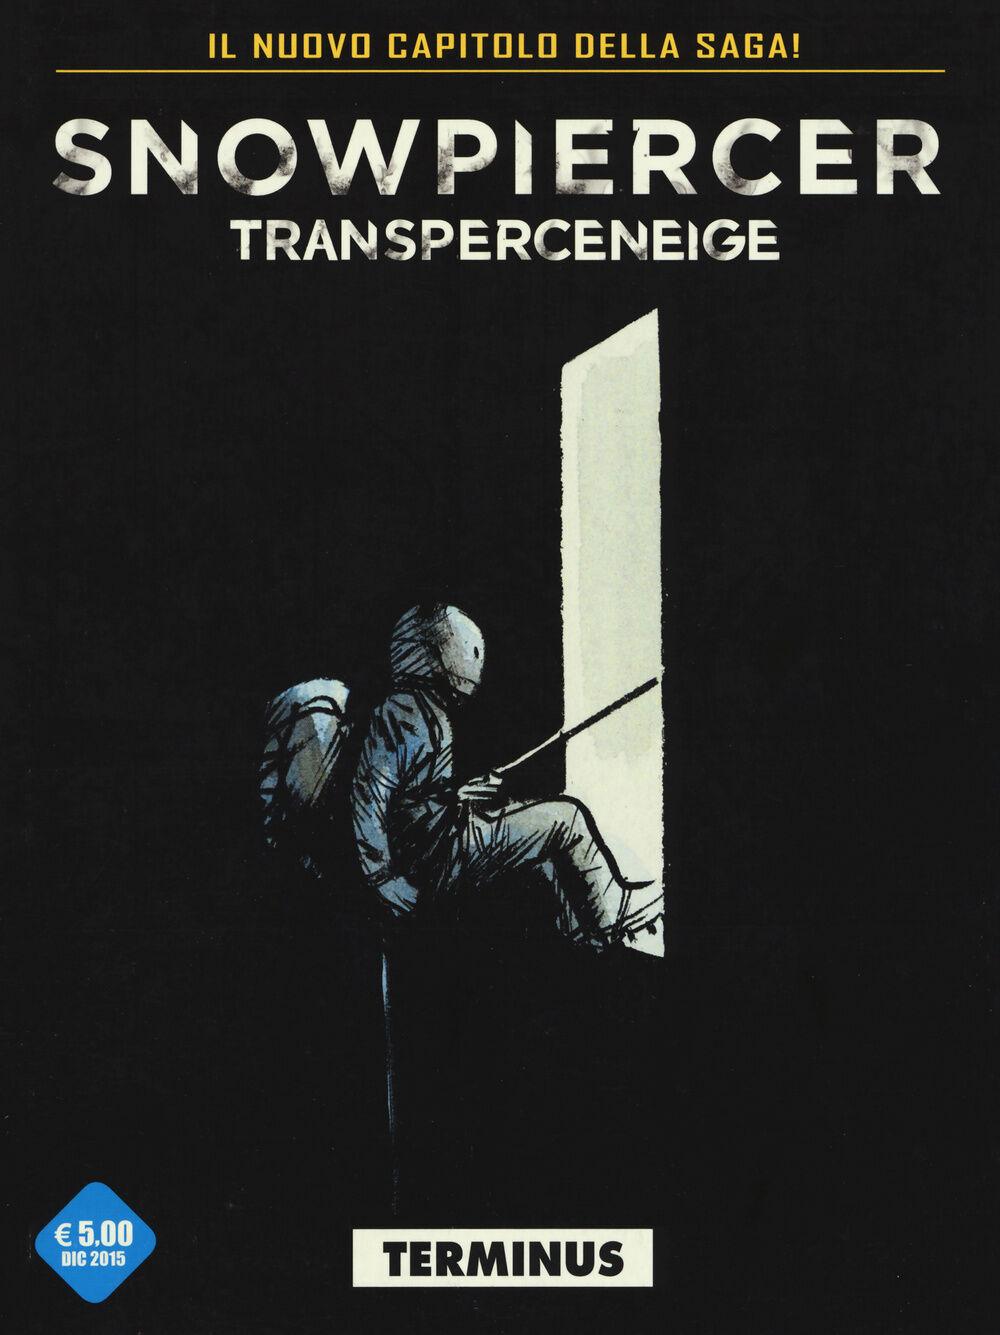 Transperceneige. Snowpiercer. Terminus. Vol. 2\1